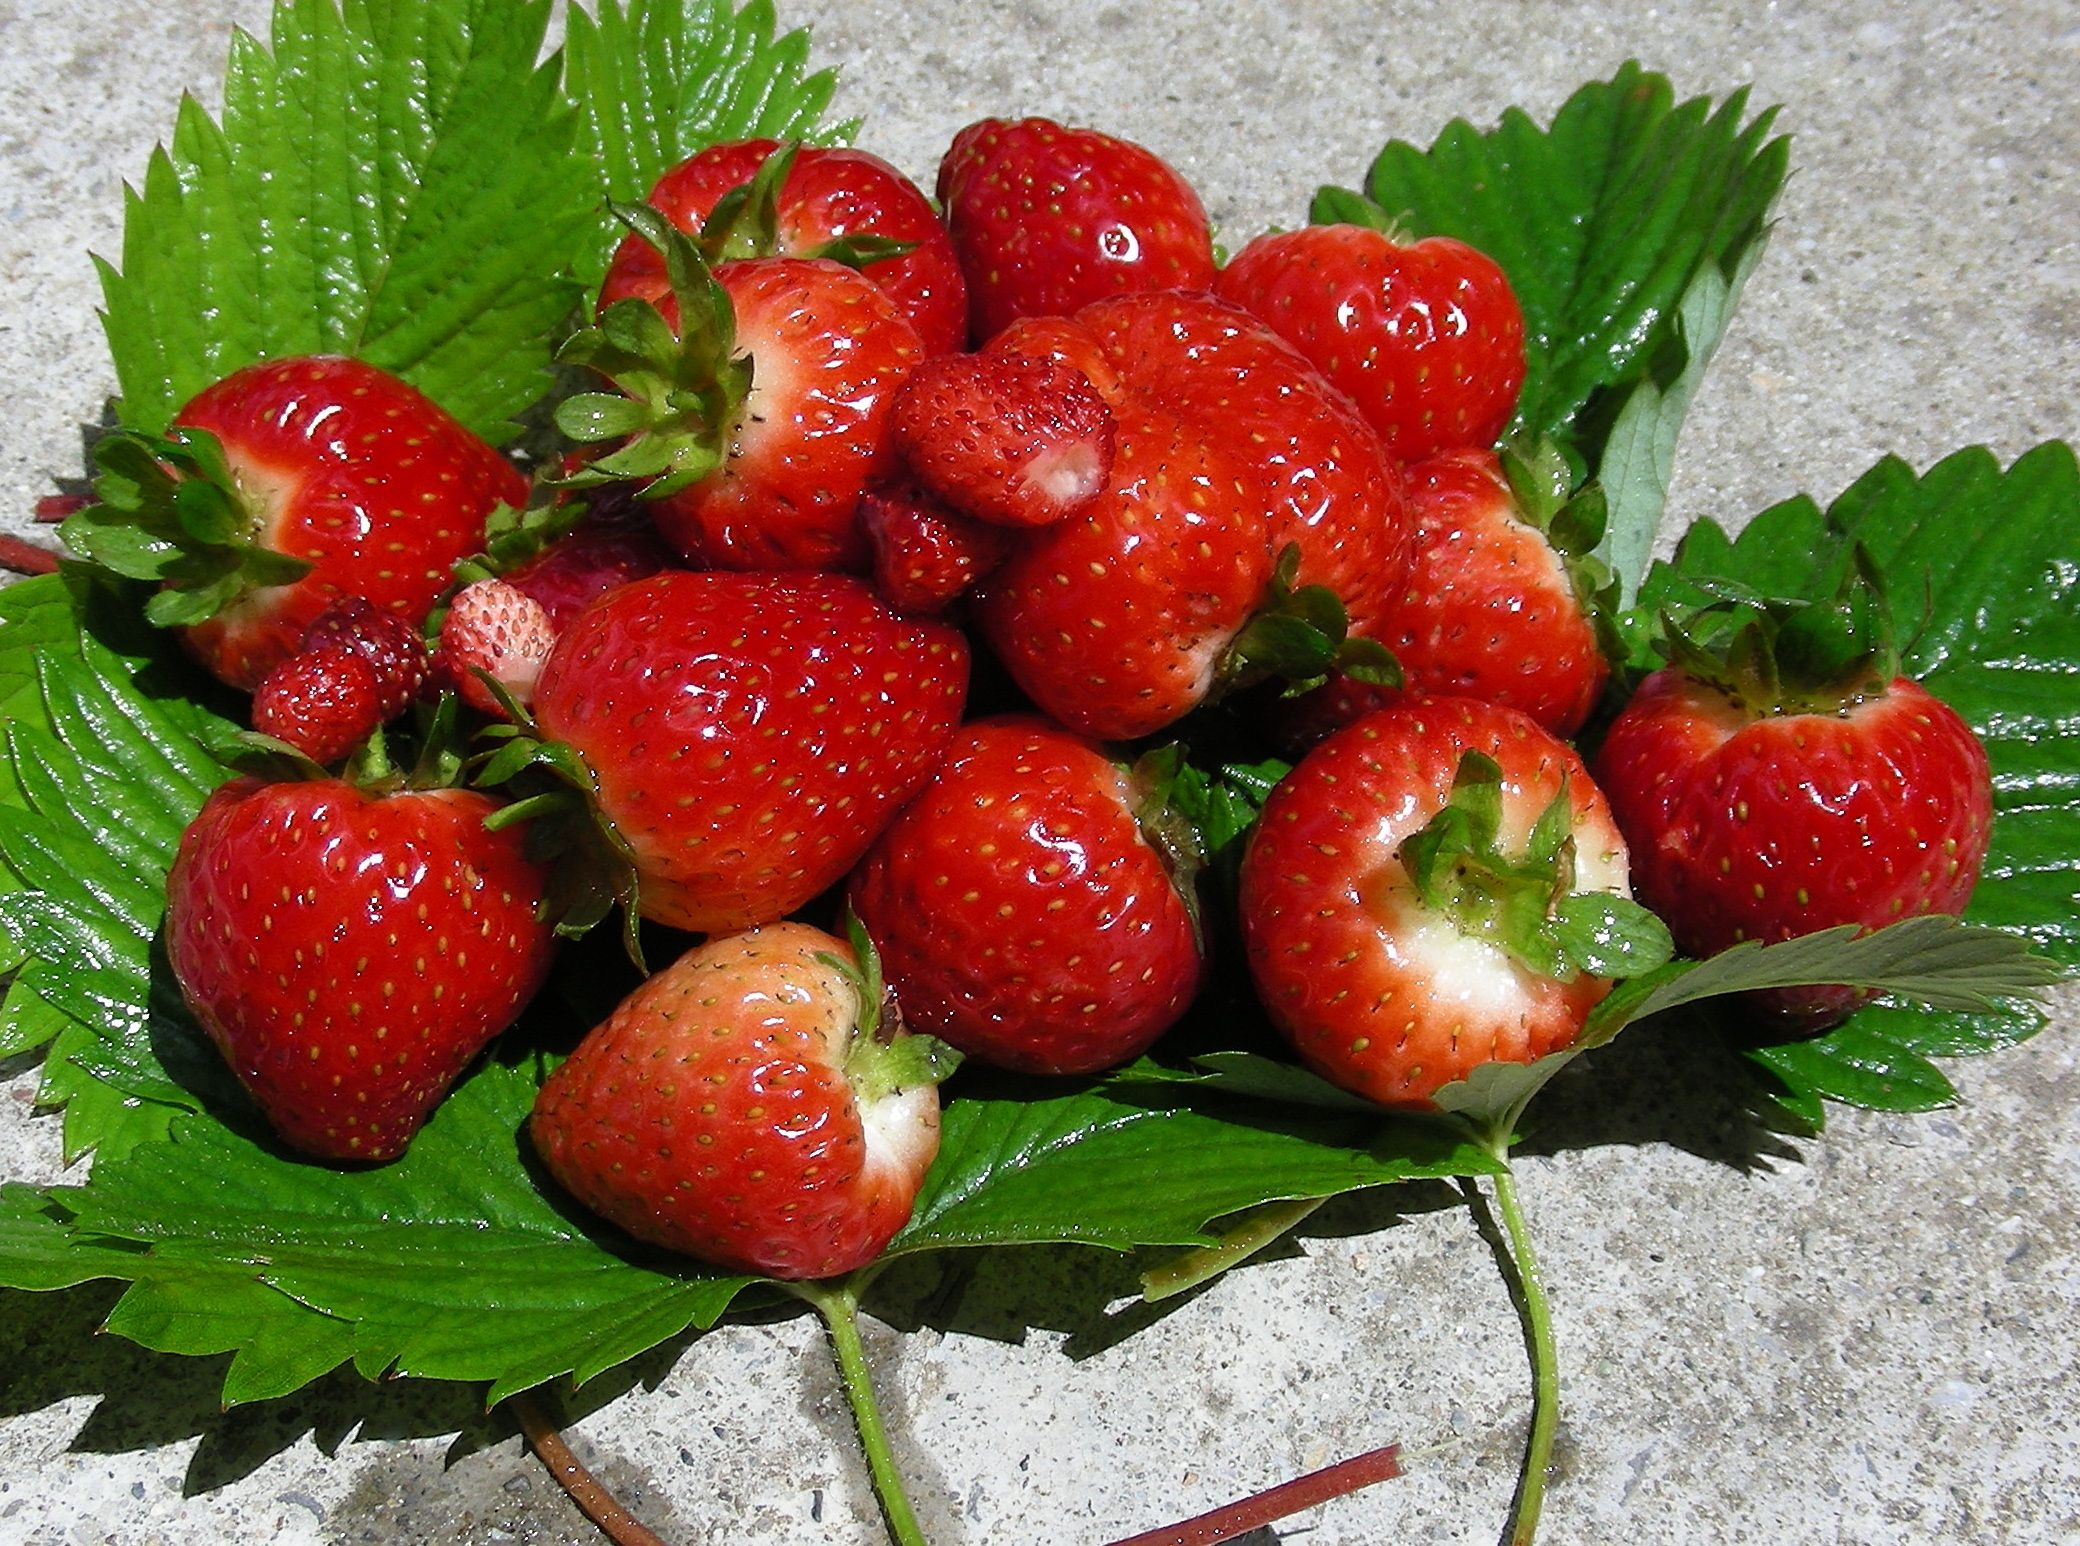 fruit strawberries 4 - photo #26